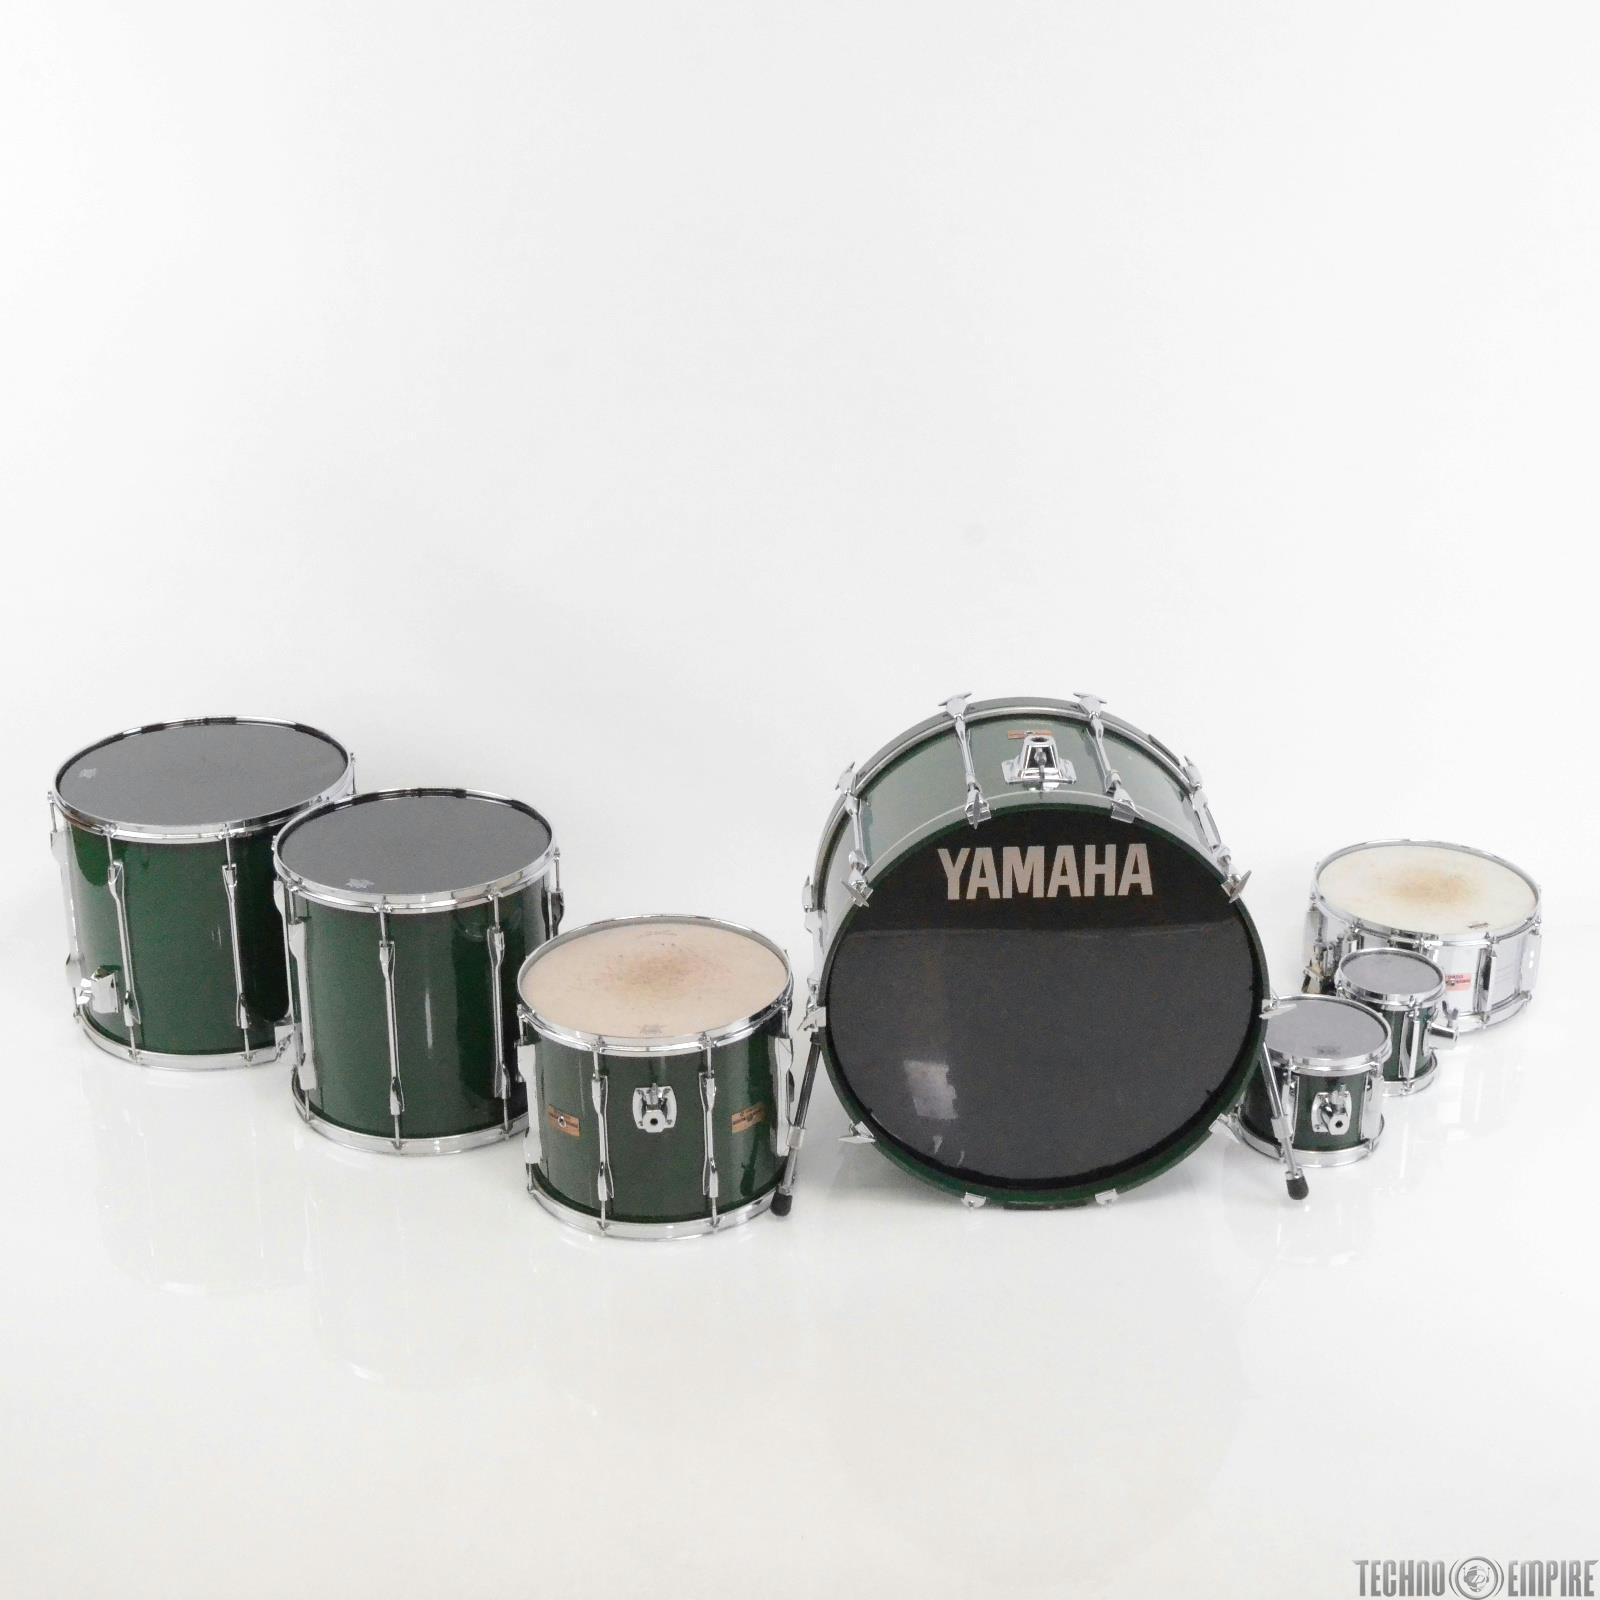 Vintage Yamaha Drums Ebay